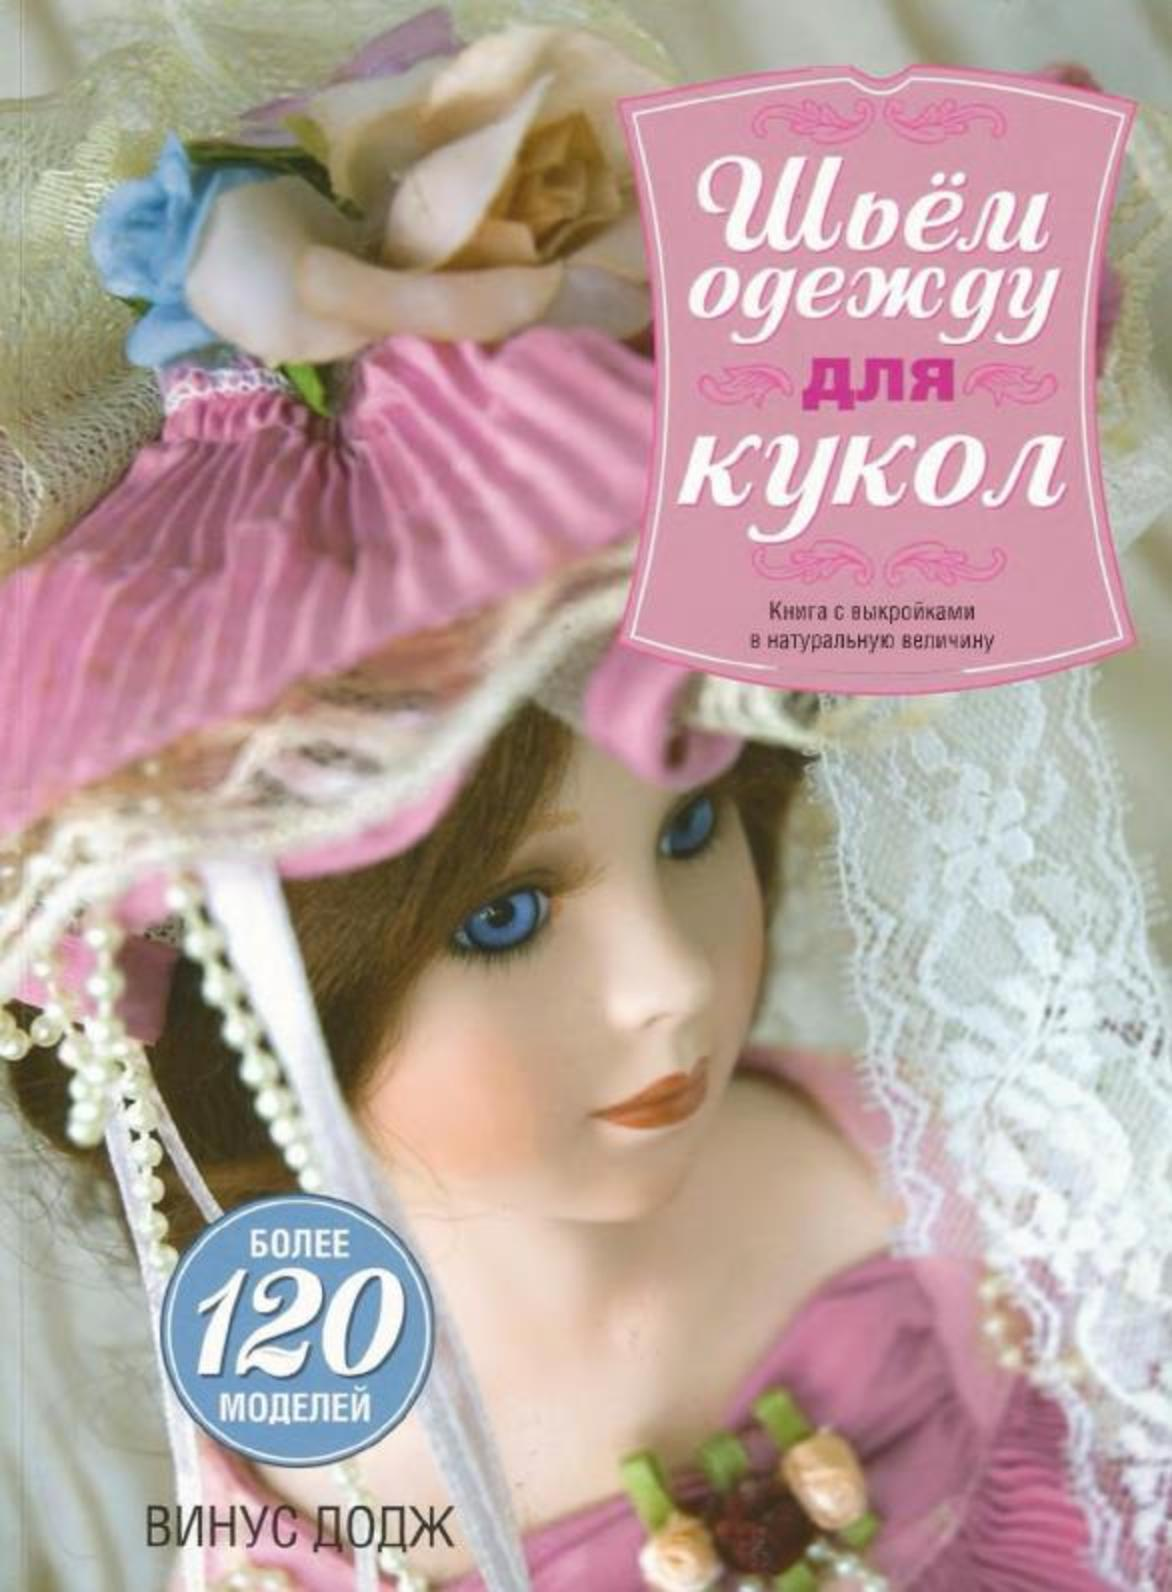 Картинки кукольных книг